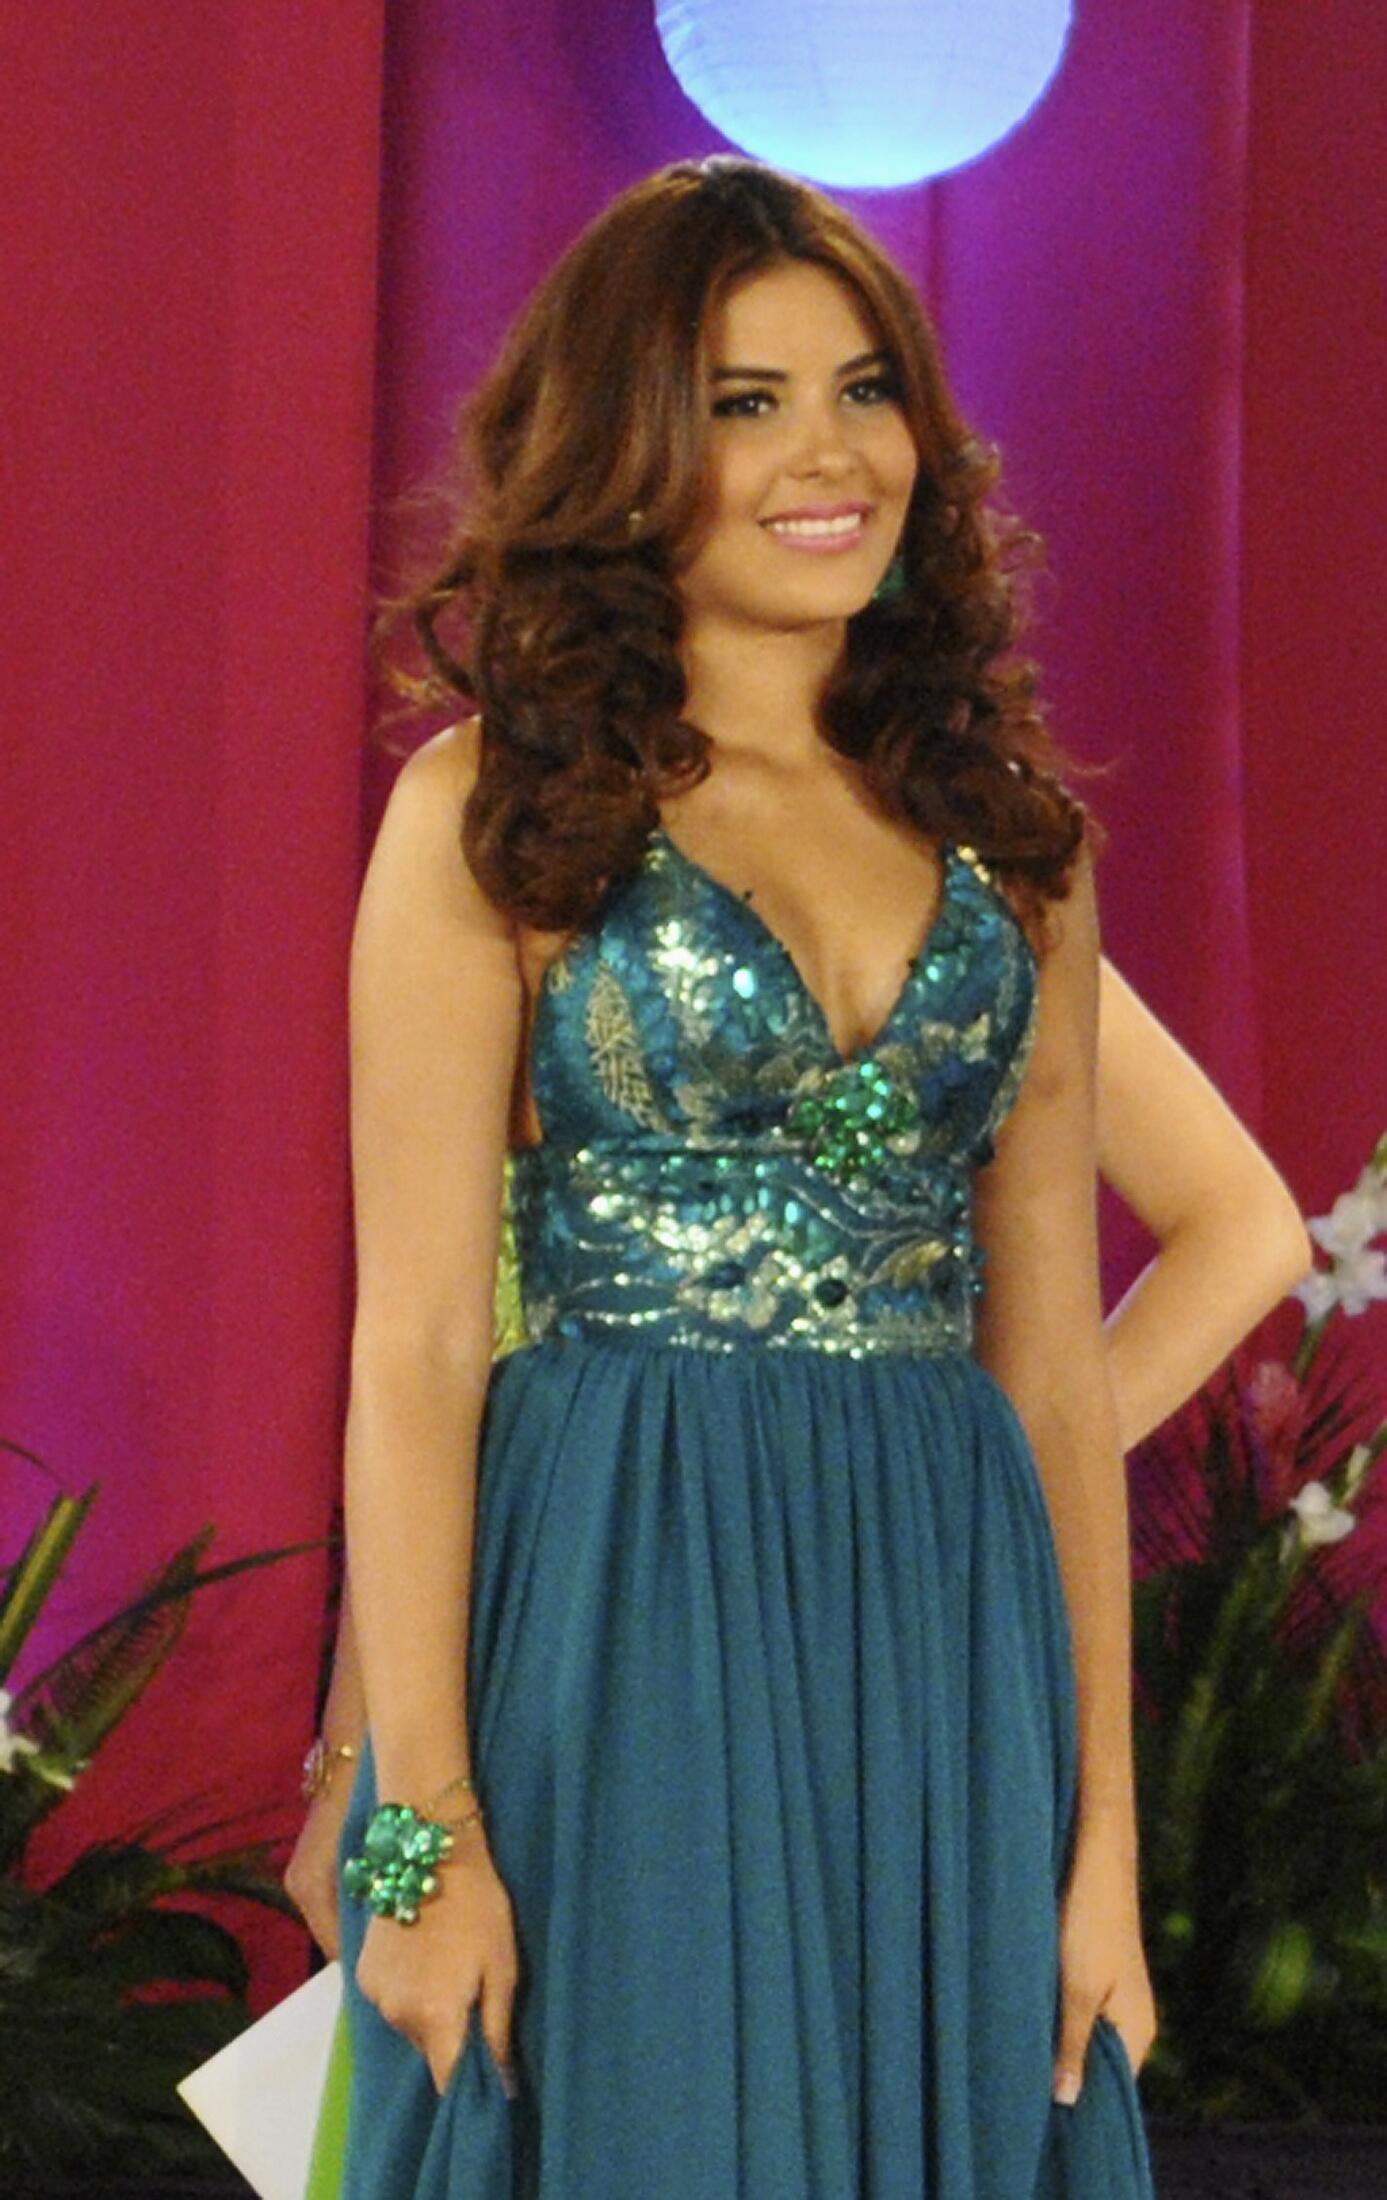 Maria Jose Alvarado, le 26 avril 2014 à San Pedro Sula, au Honduras.